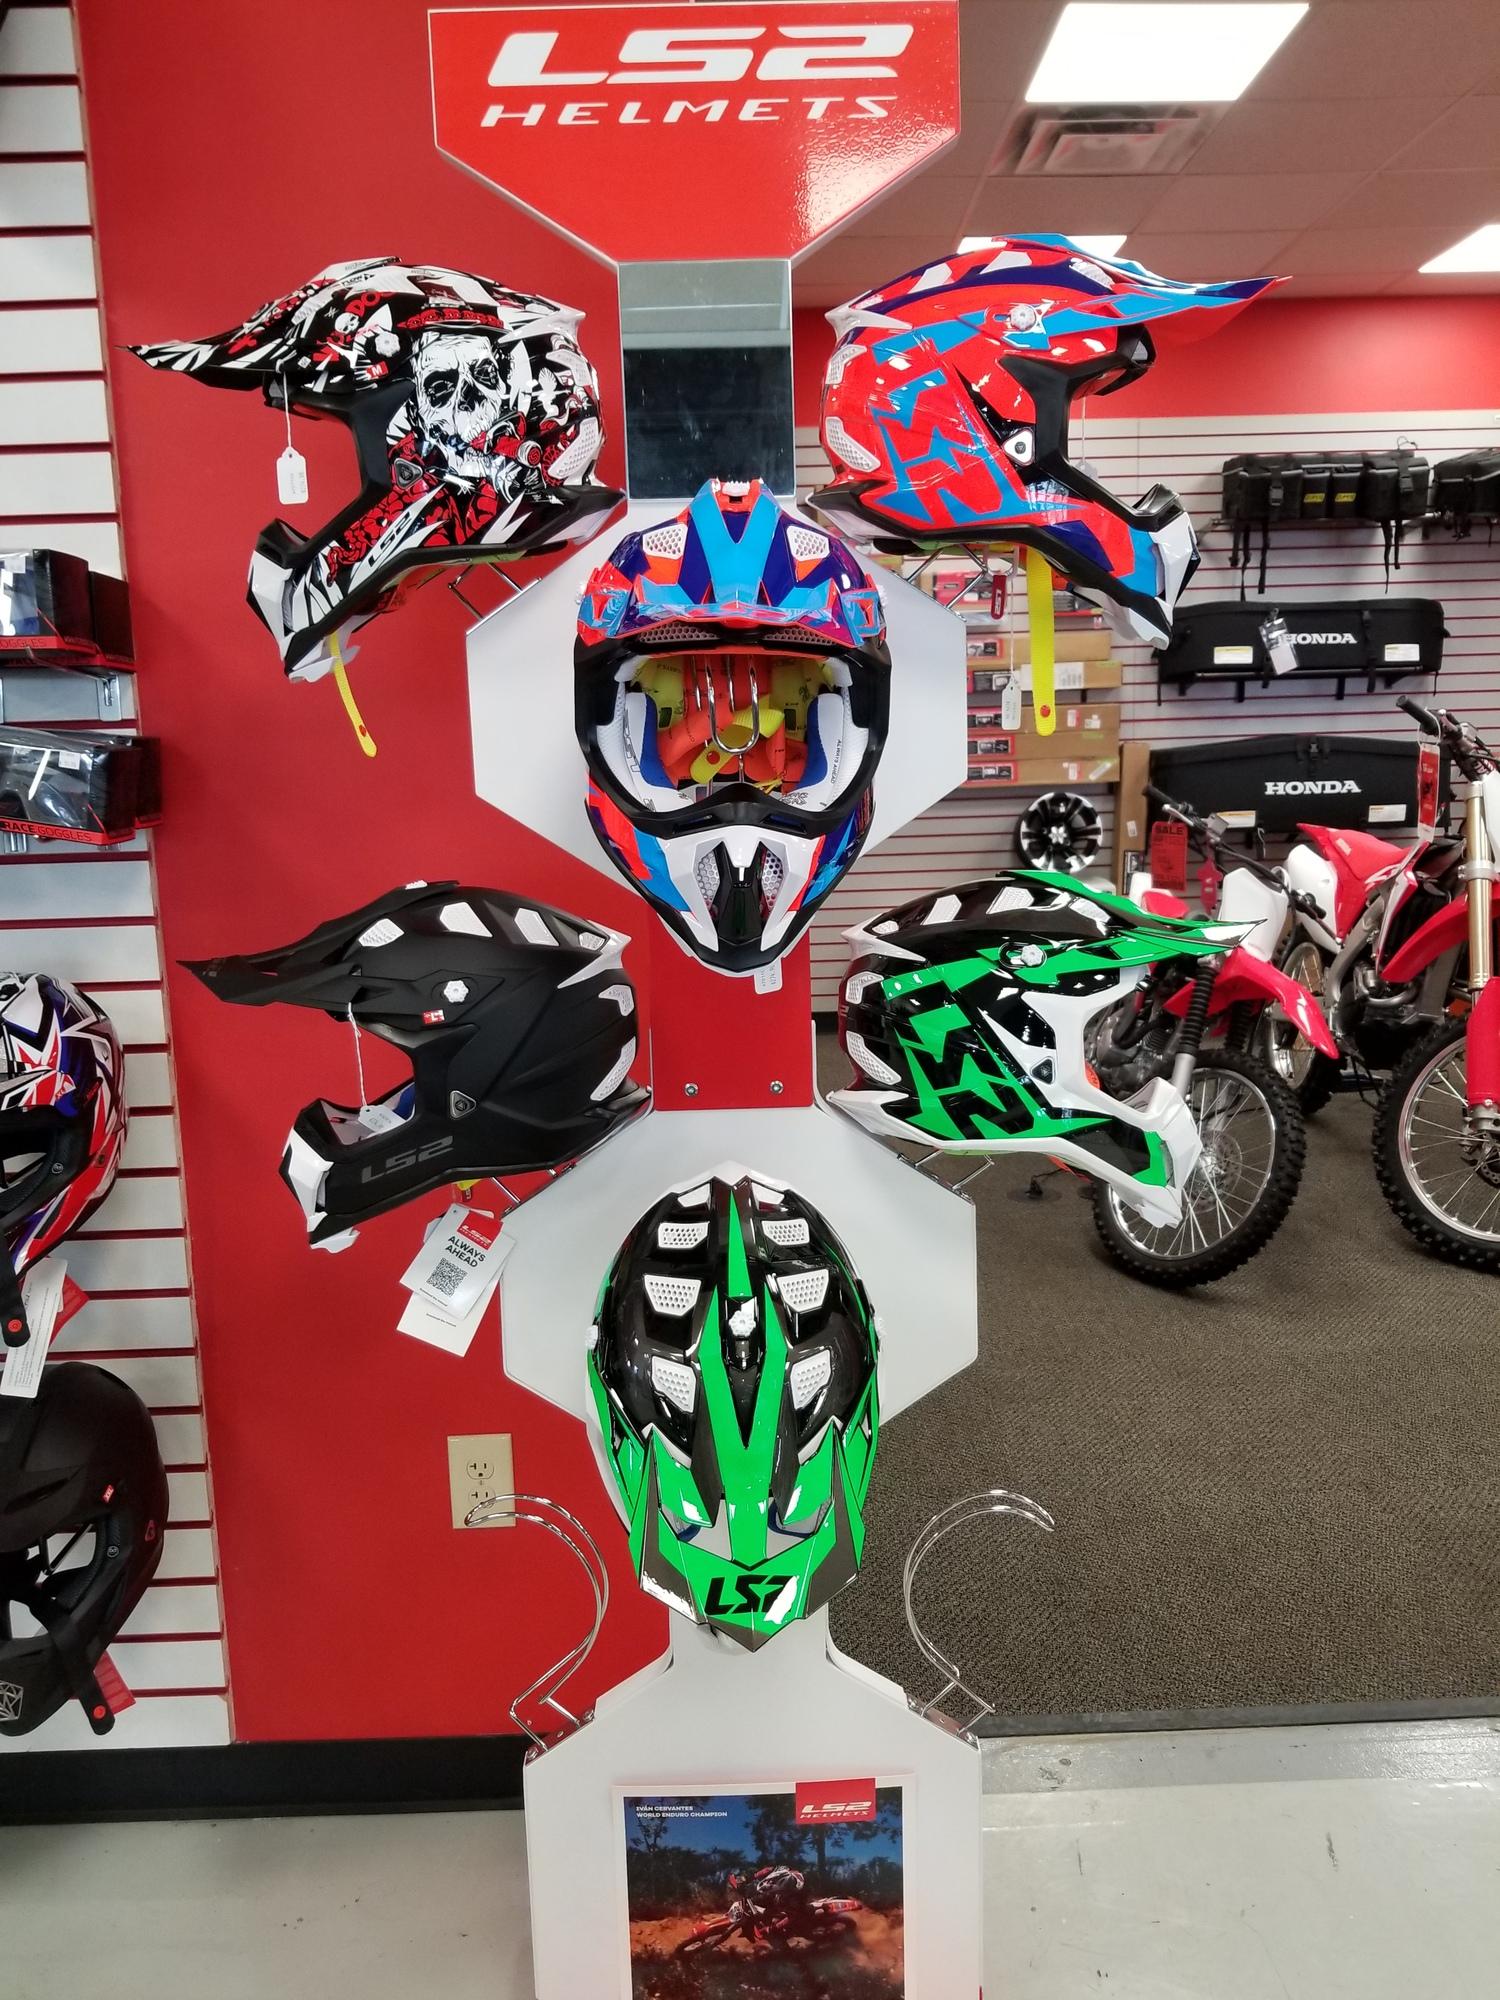 Charming Buy Honda Motorcycle Accessories Online